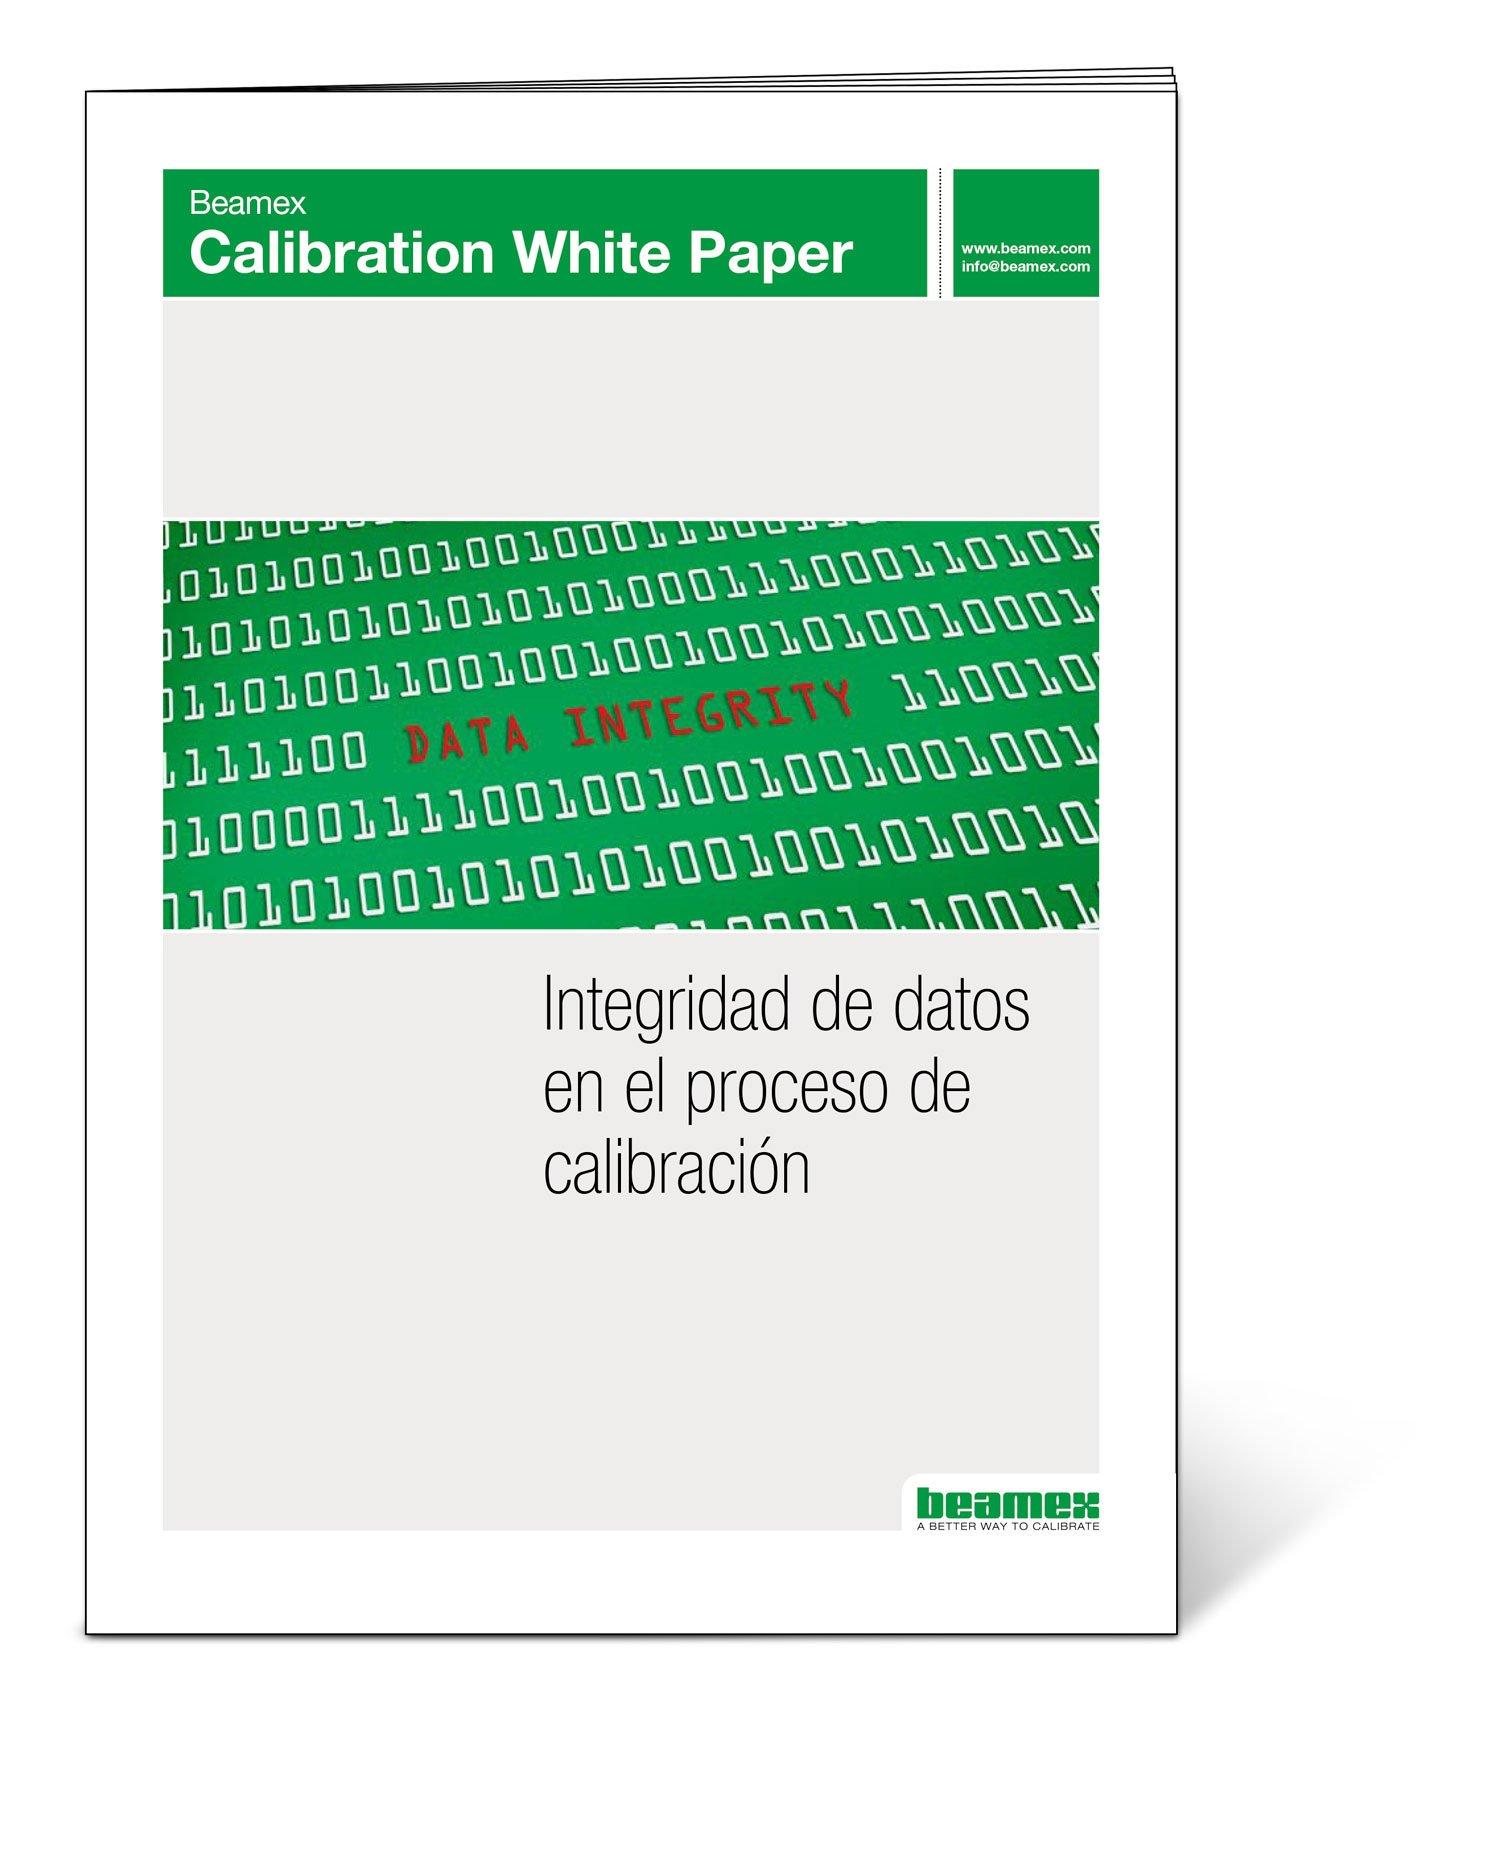 Beamex-WP-Data-integrity-1500px-v1_esp.jpg